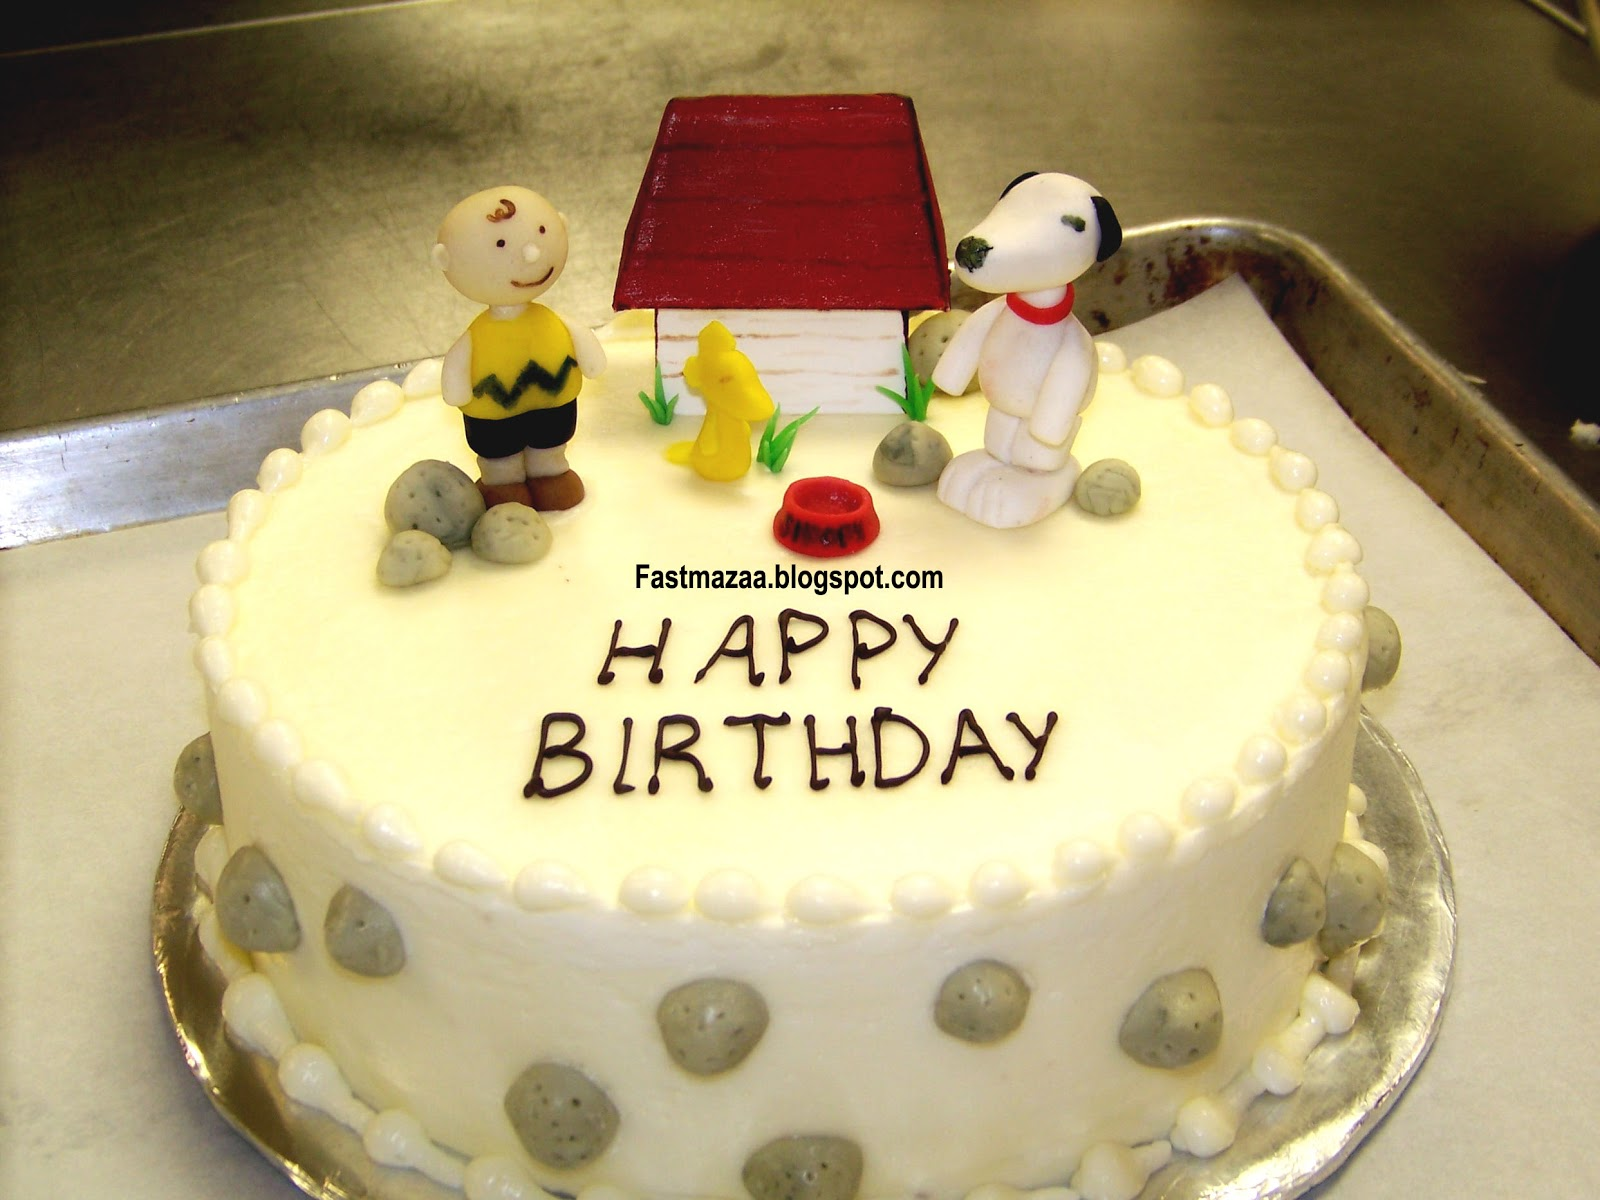 Birthday Cake With Name Qamar ~ Happy birthday to you qamar youtube